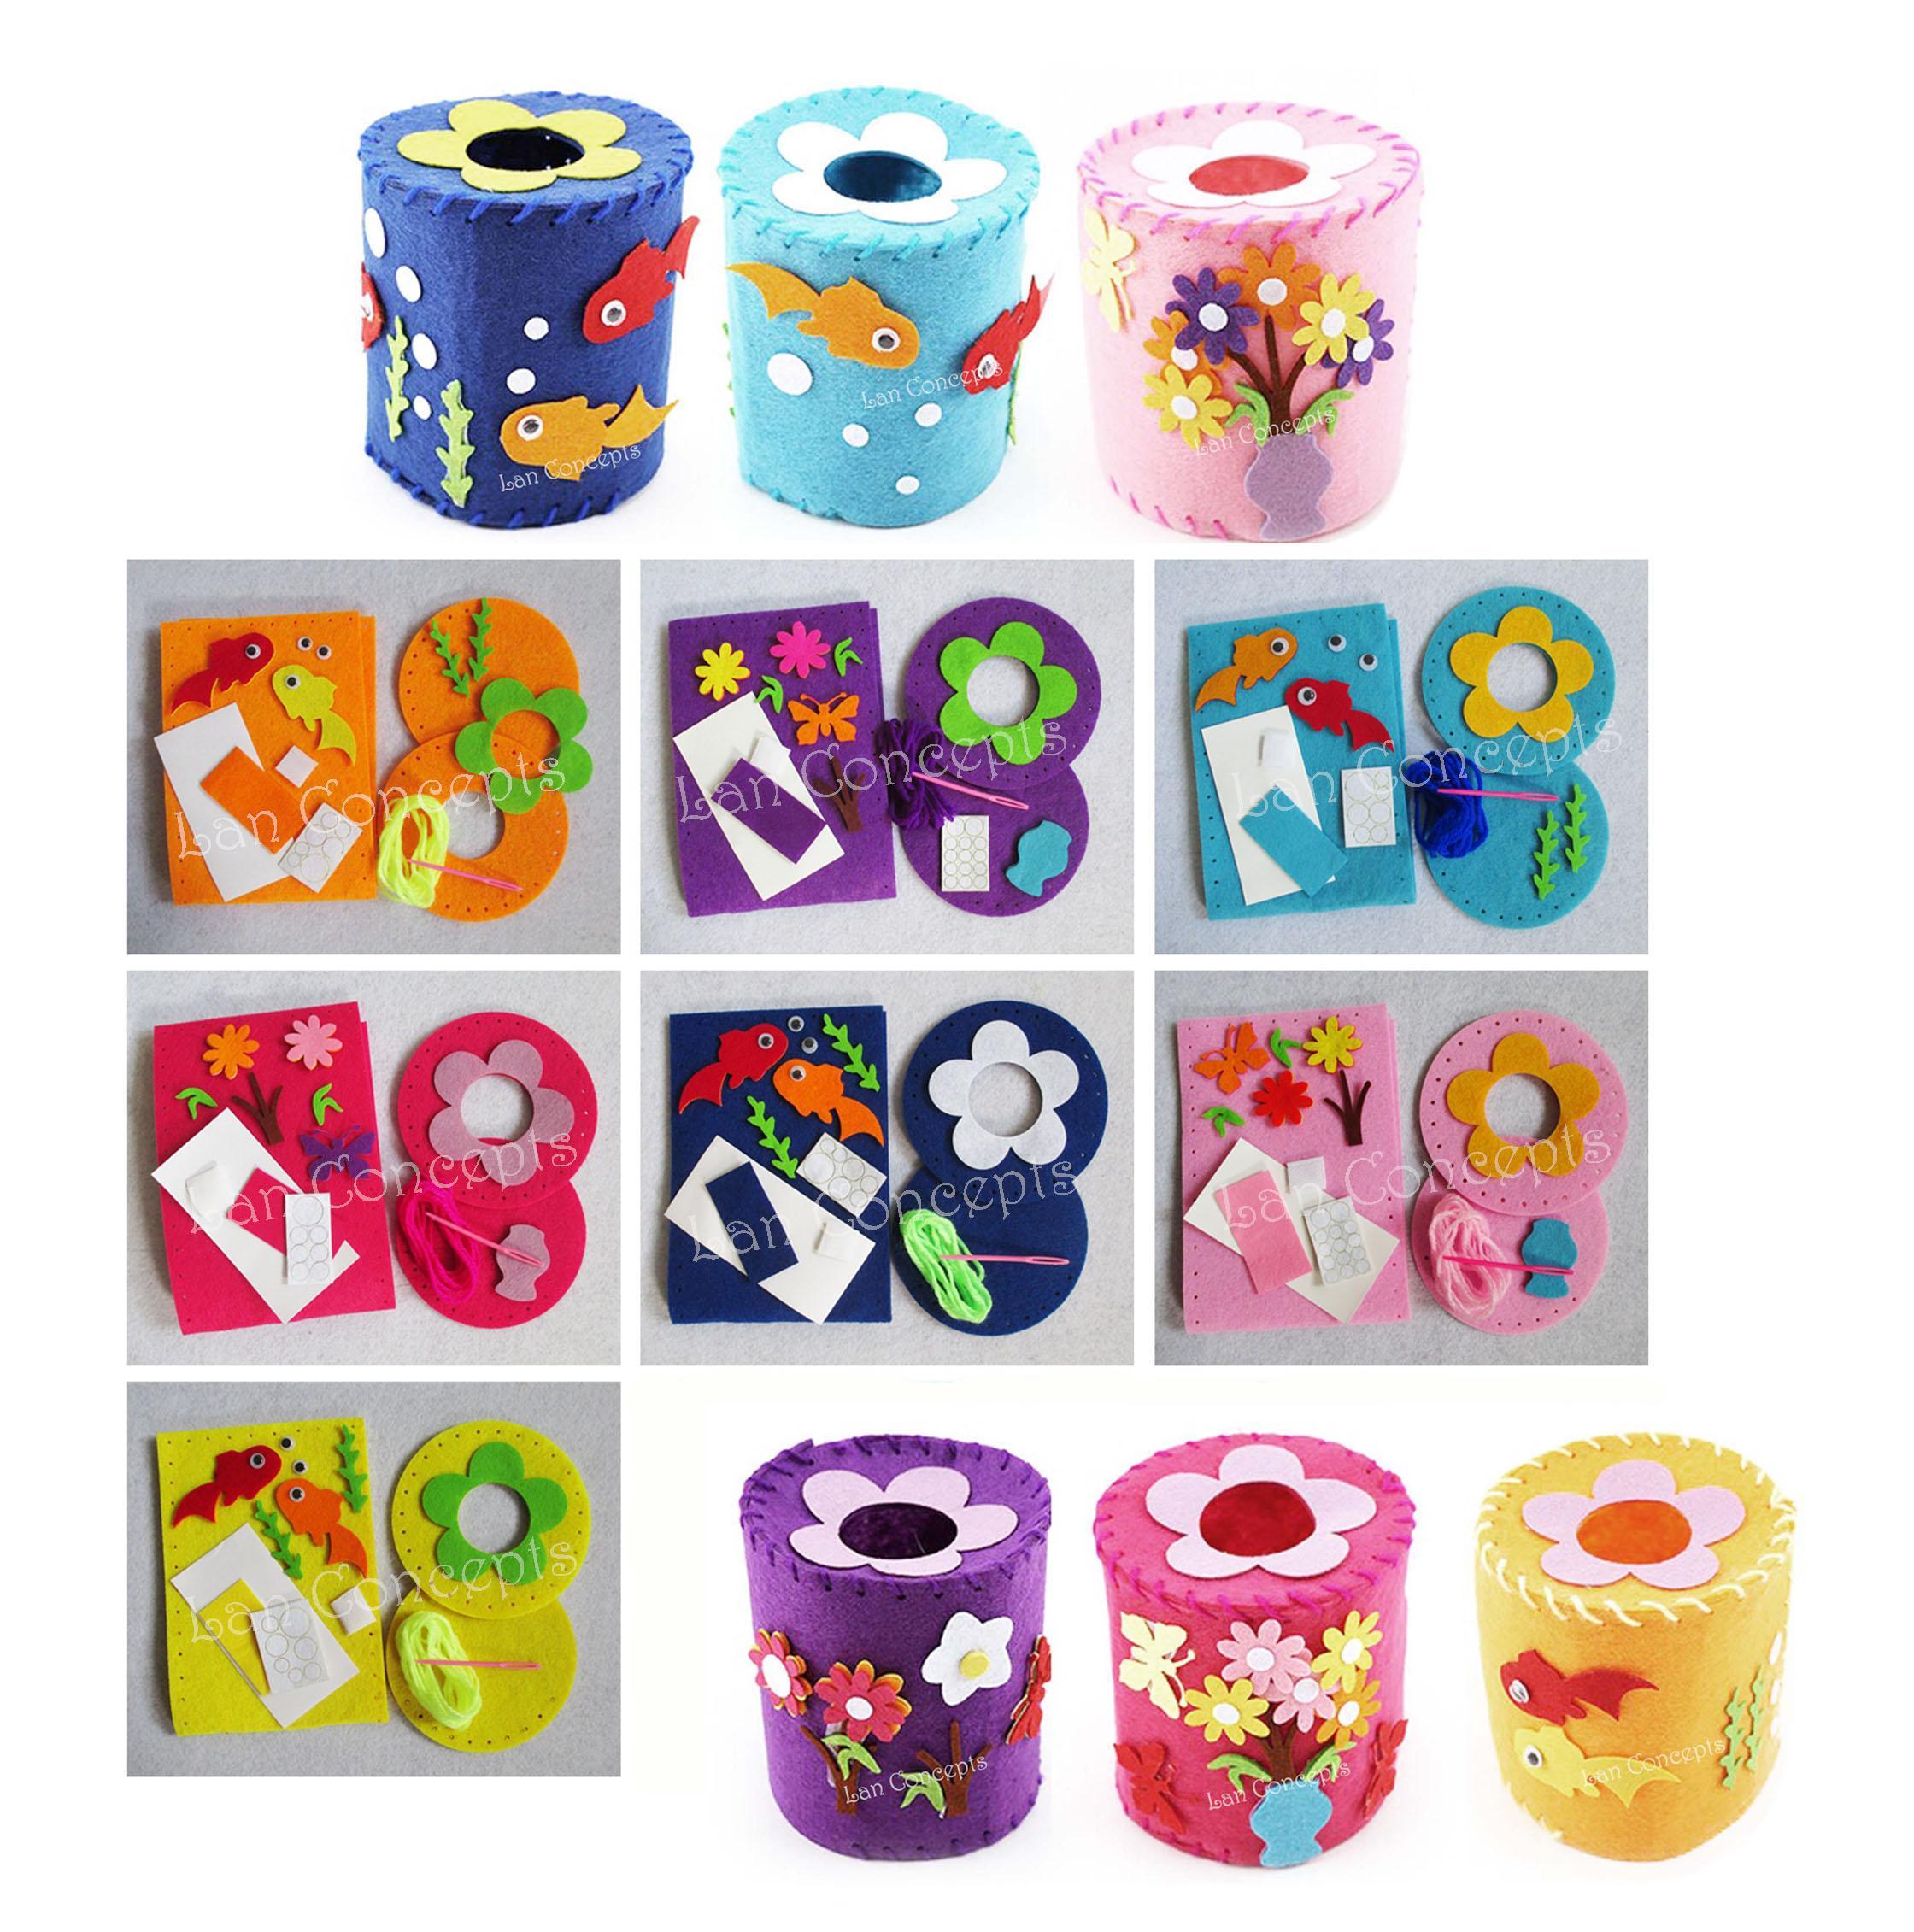 Craft kit for kids - See Larger Image